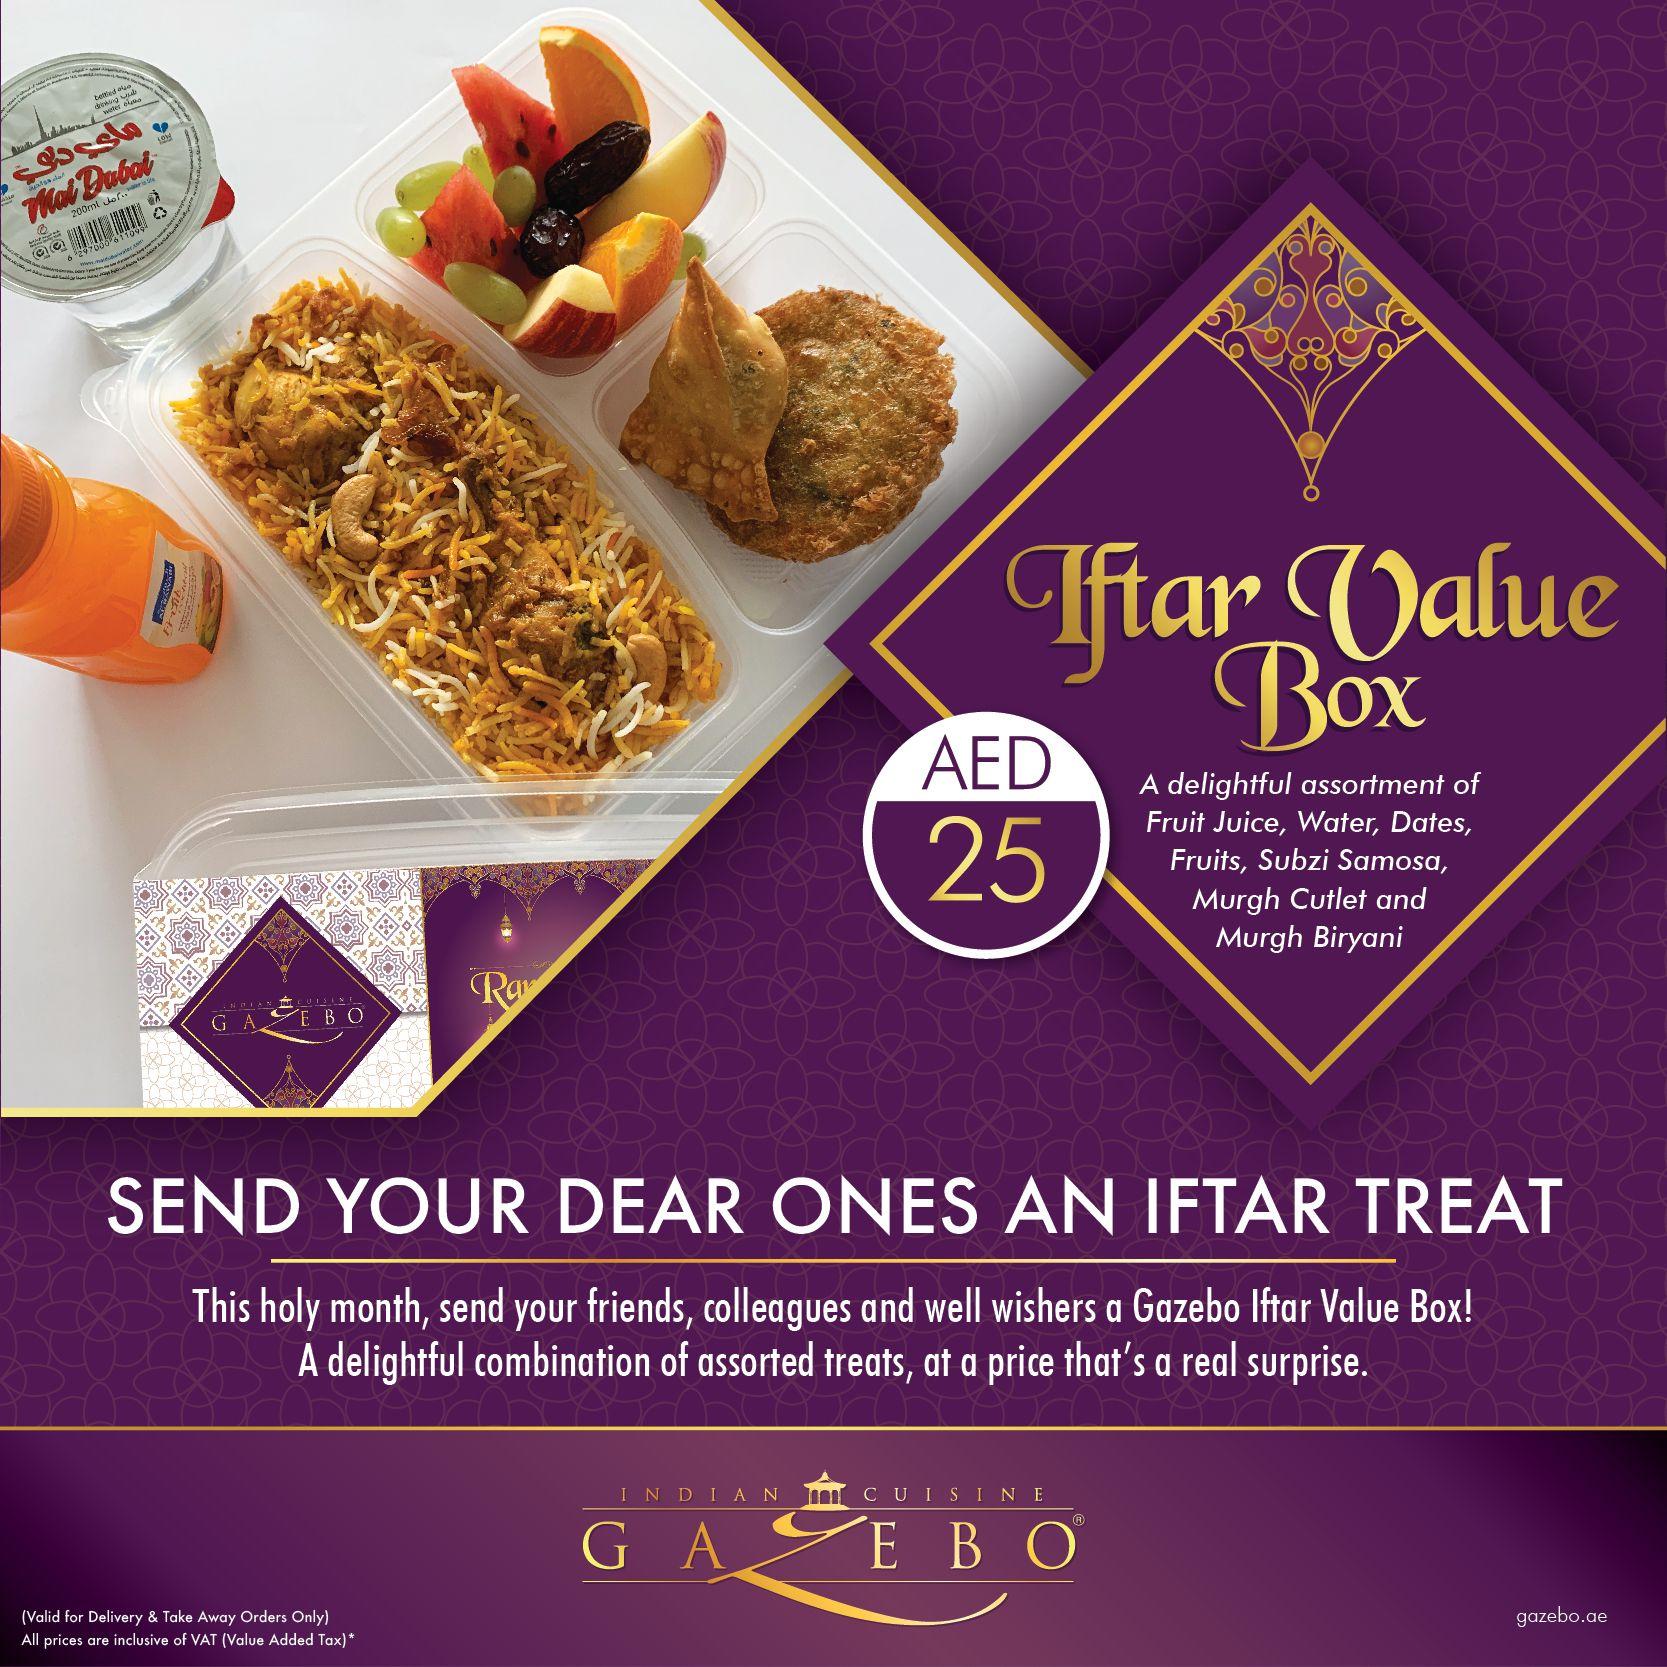 Send Your Dear Ones An Iftar Treat Indiancuisine Uae Dubai